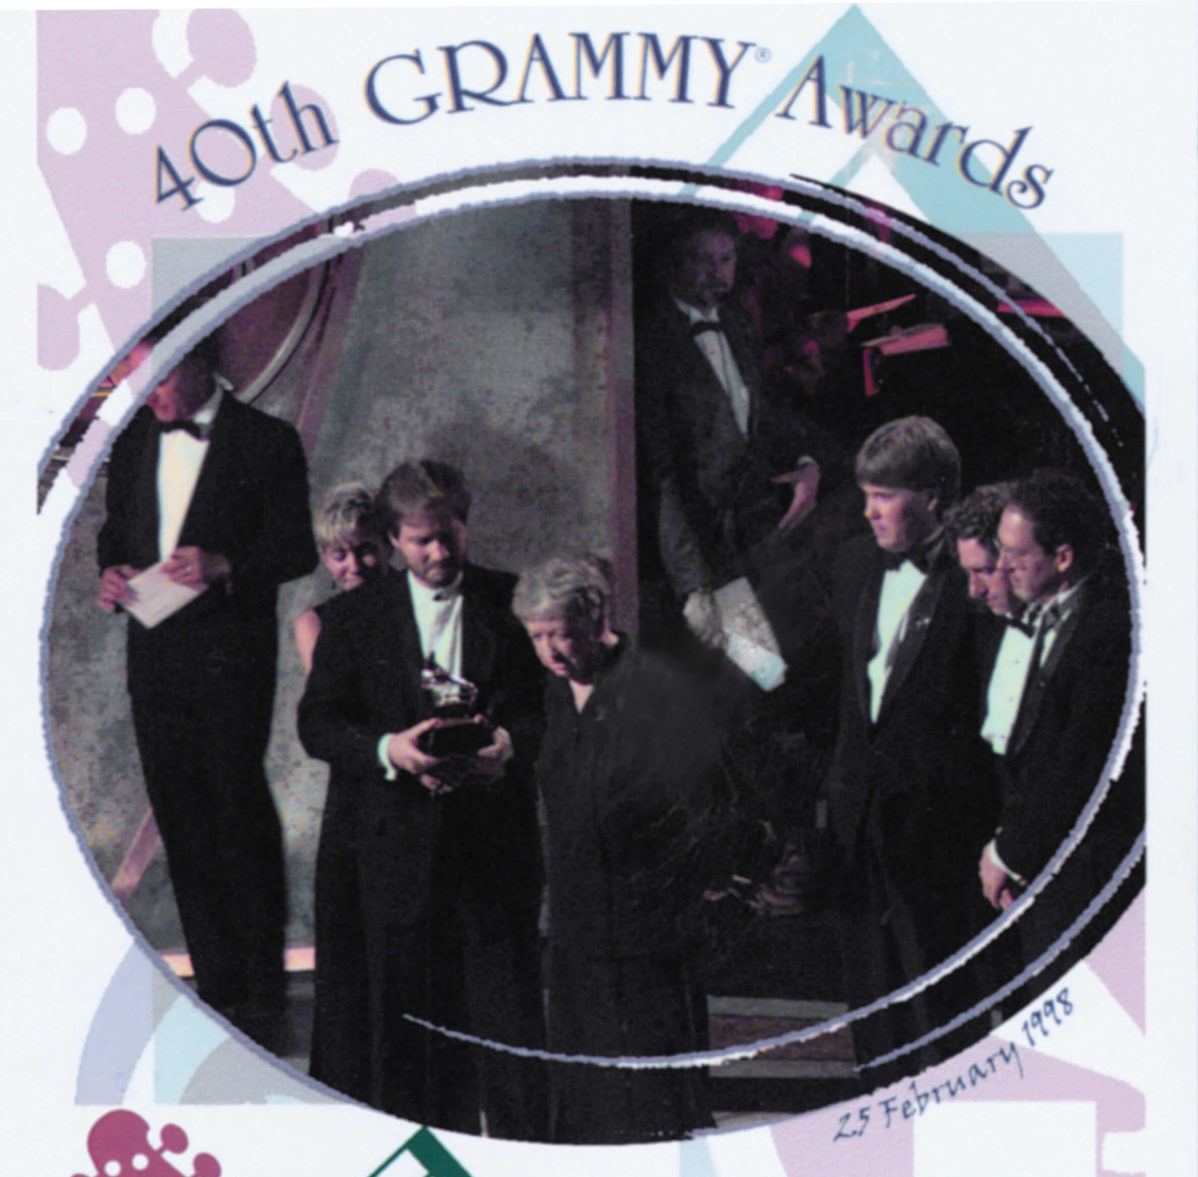 Michael Hedges 1998 Grammy Awards